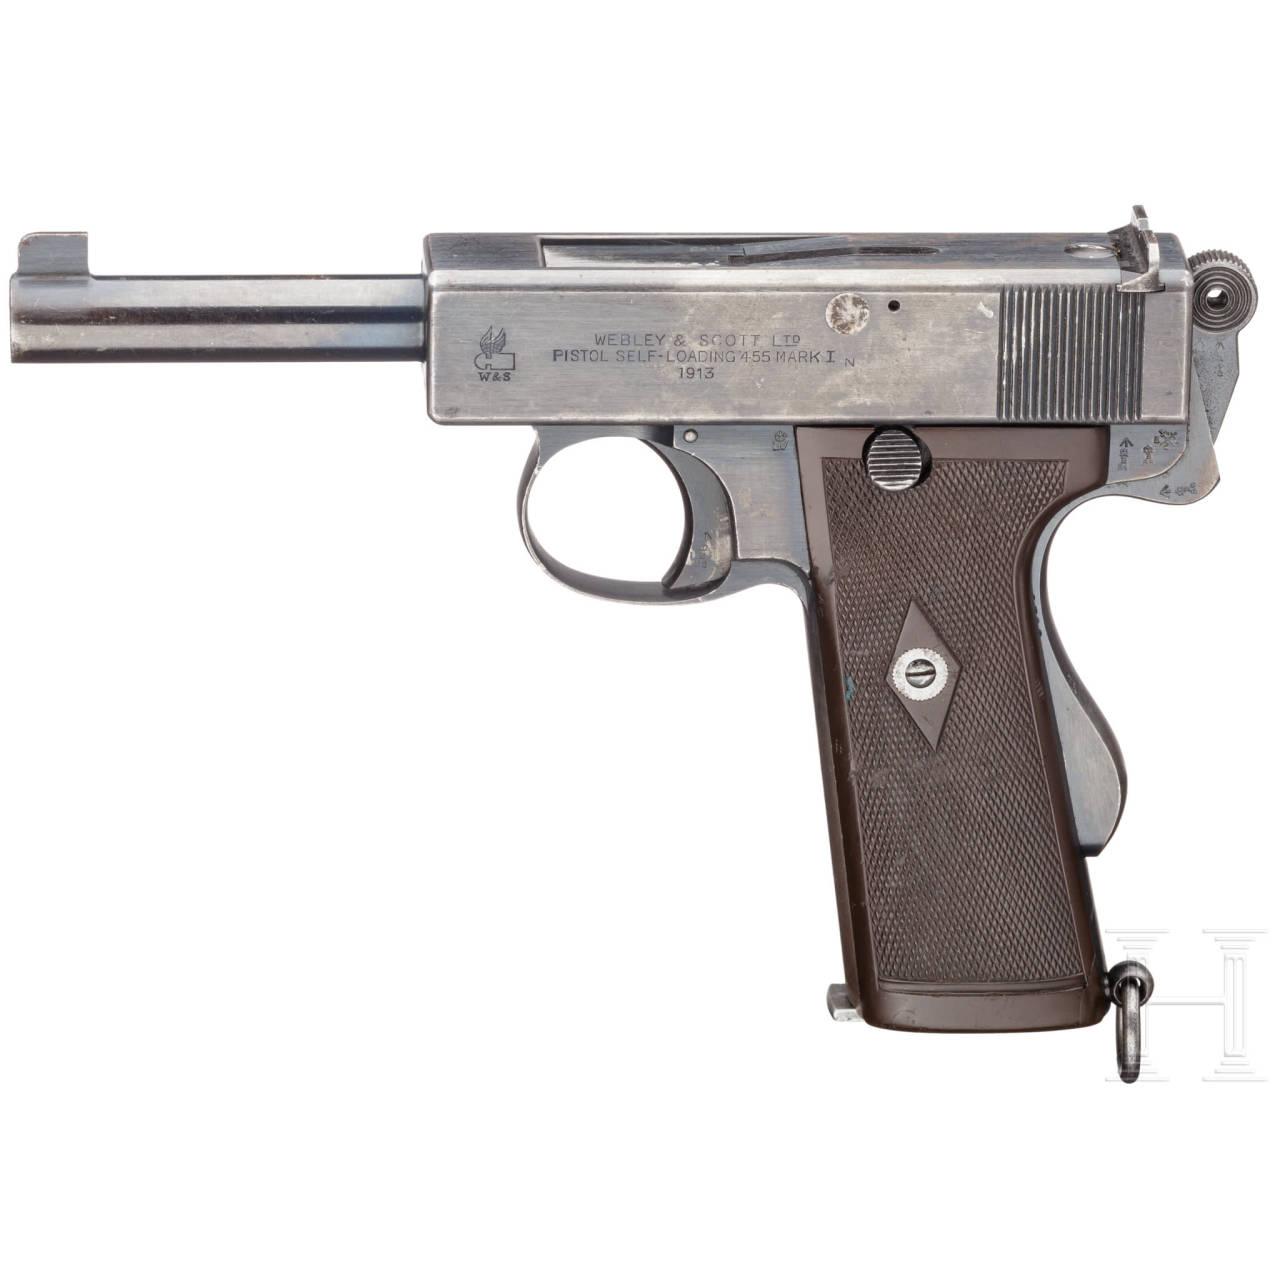 A Webley & Scott Mark I N (Navy model) with holster